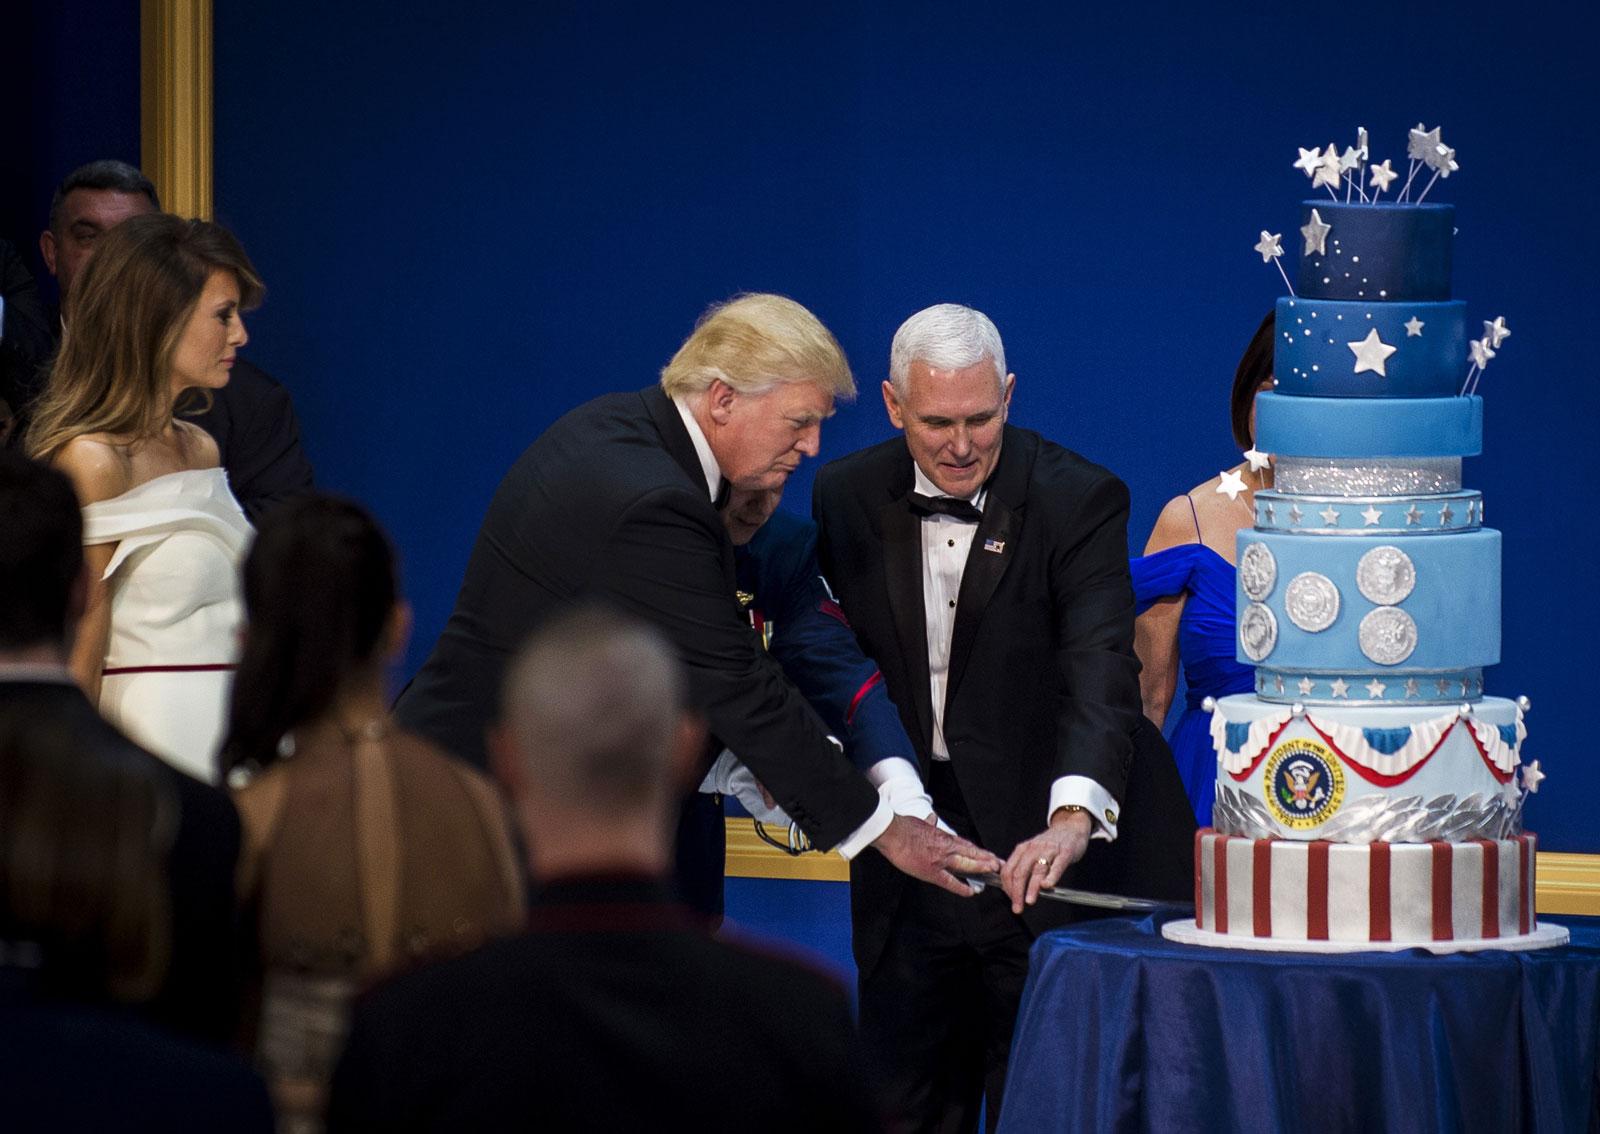 First Lady Melania Trump, President Donald Trump, and Vice President Mike Pence, Washington, D.C., January 20, 2017